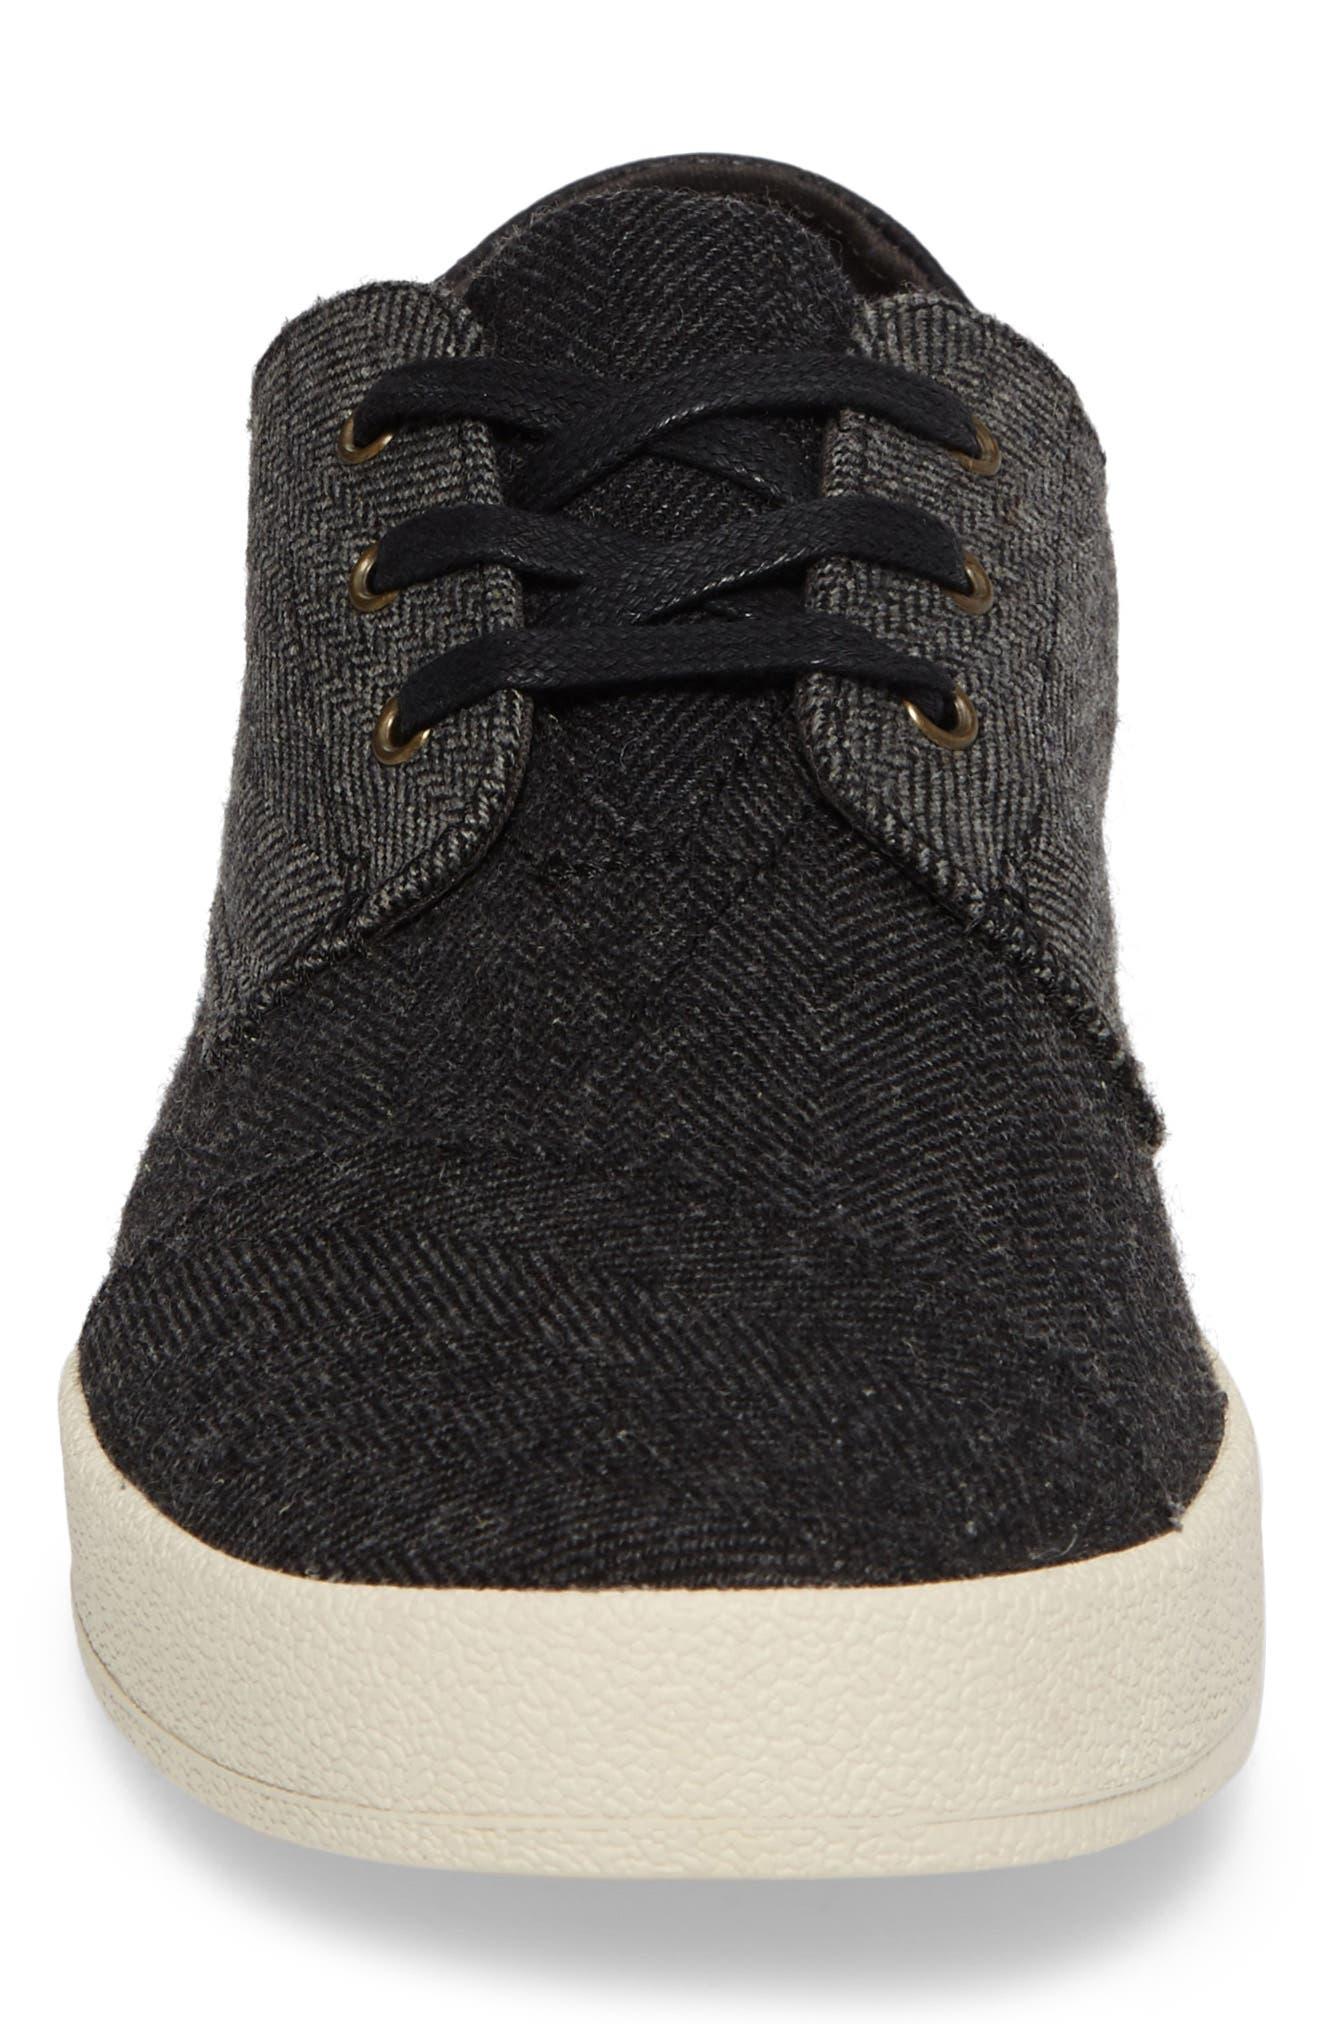 'Paseo' Sneaker,                             Alternate thumbnail 4, color,                             BLACK/ GREY